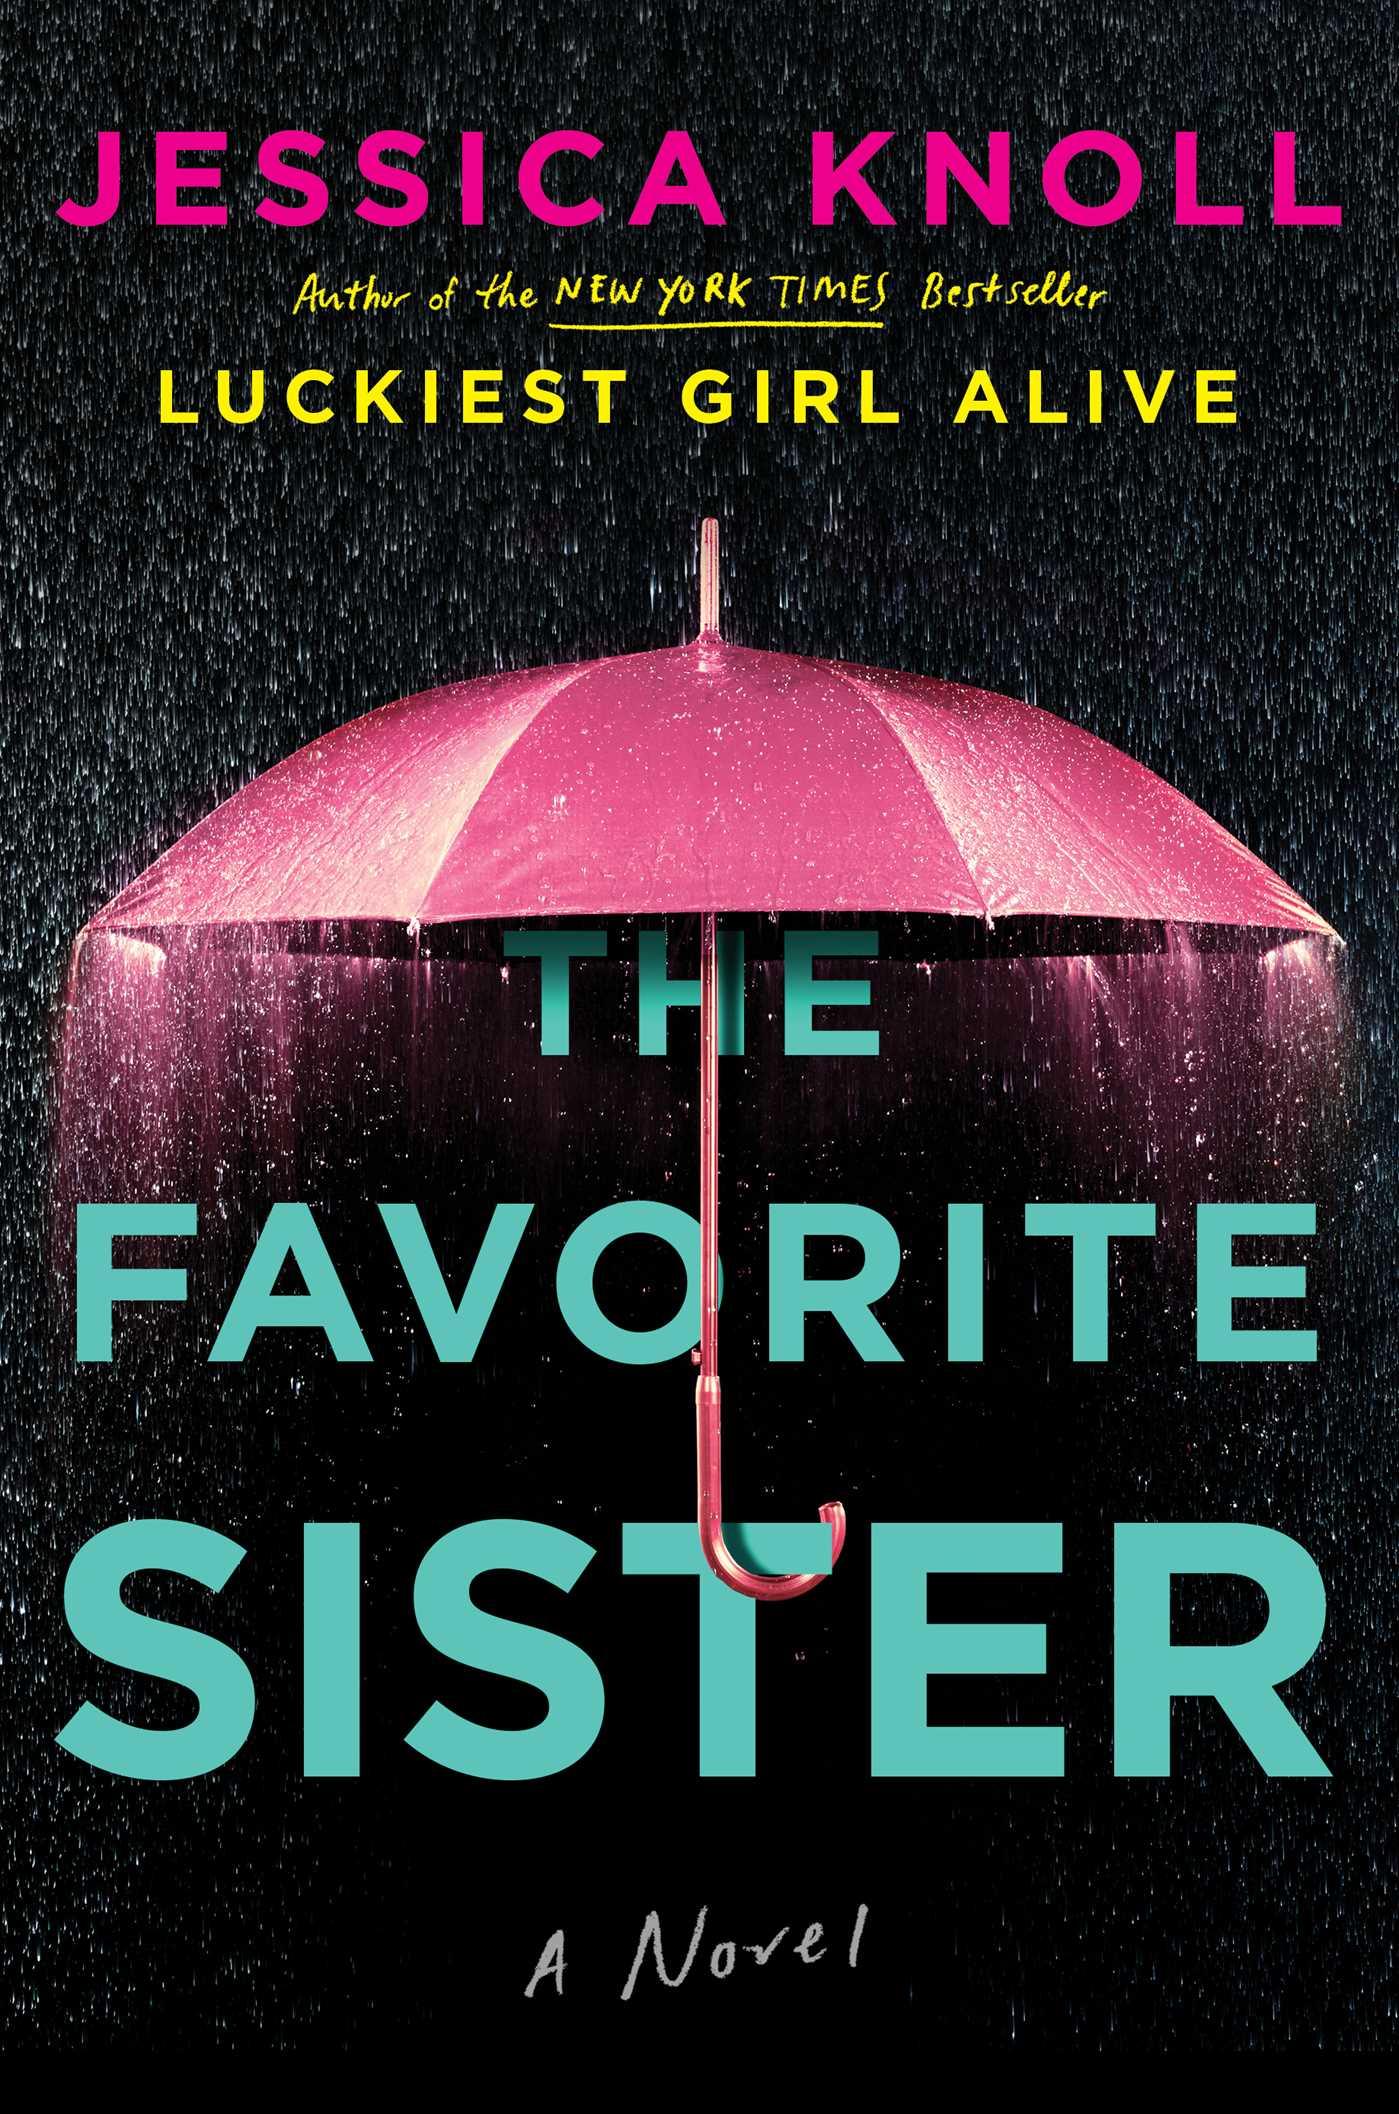 The Favorite Sister - Released through Simon & Schuster